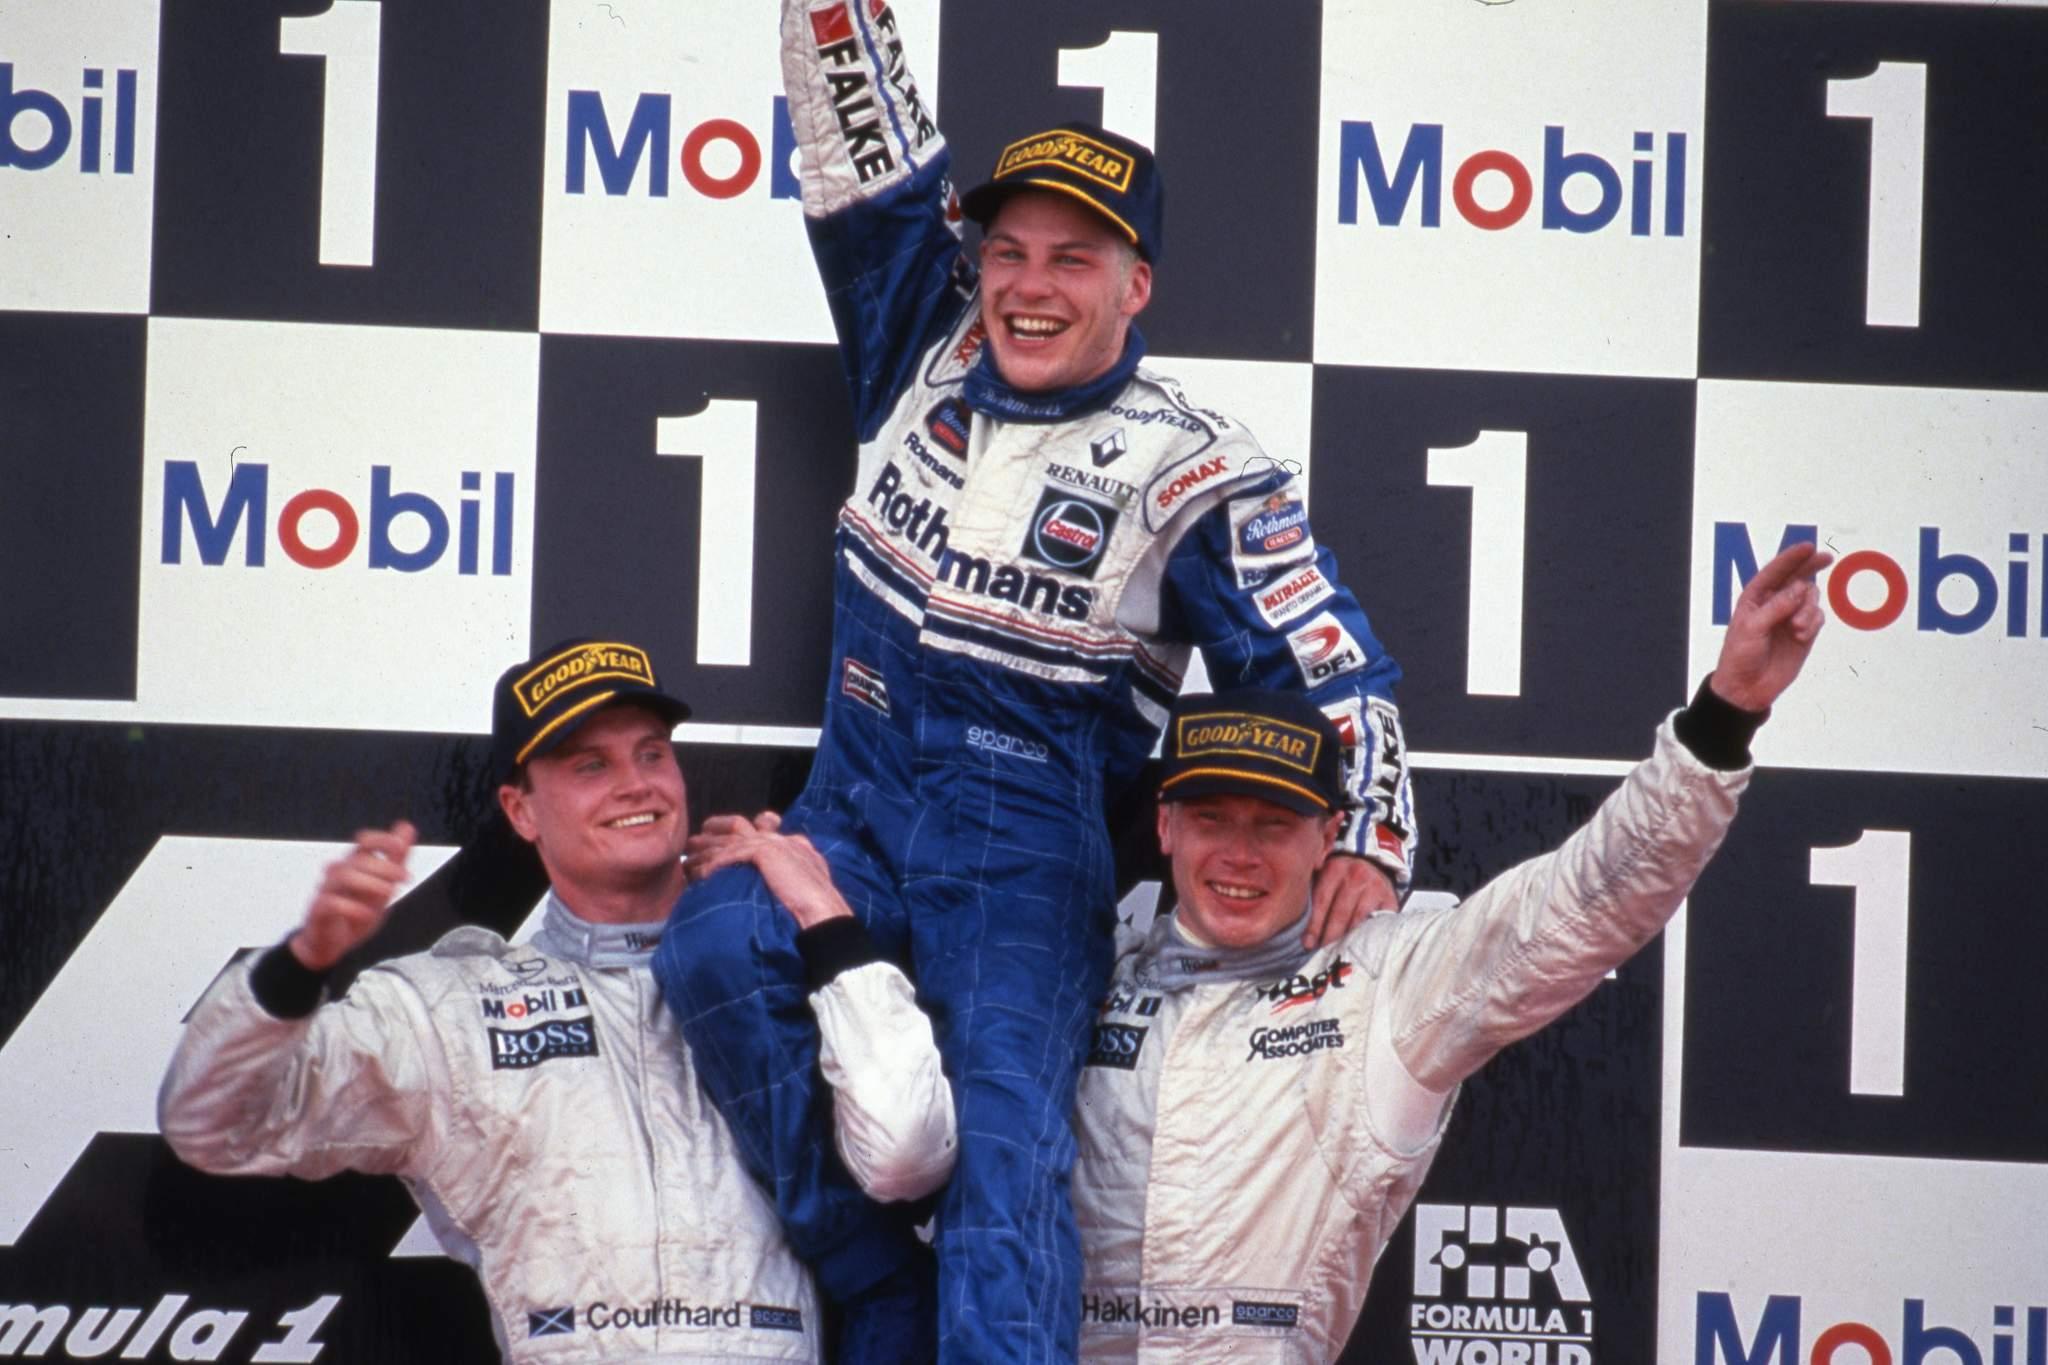 European Grand Prix Jerez Se La Frontera (esp) 24 26 10 1997